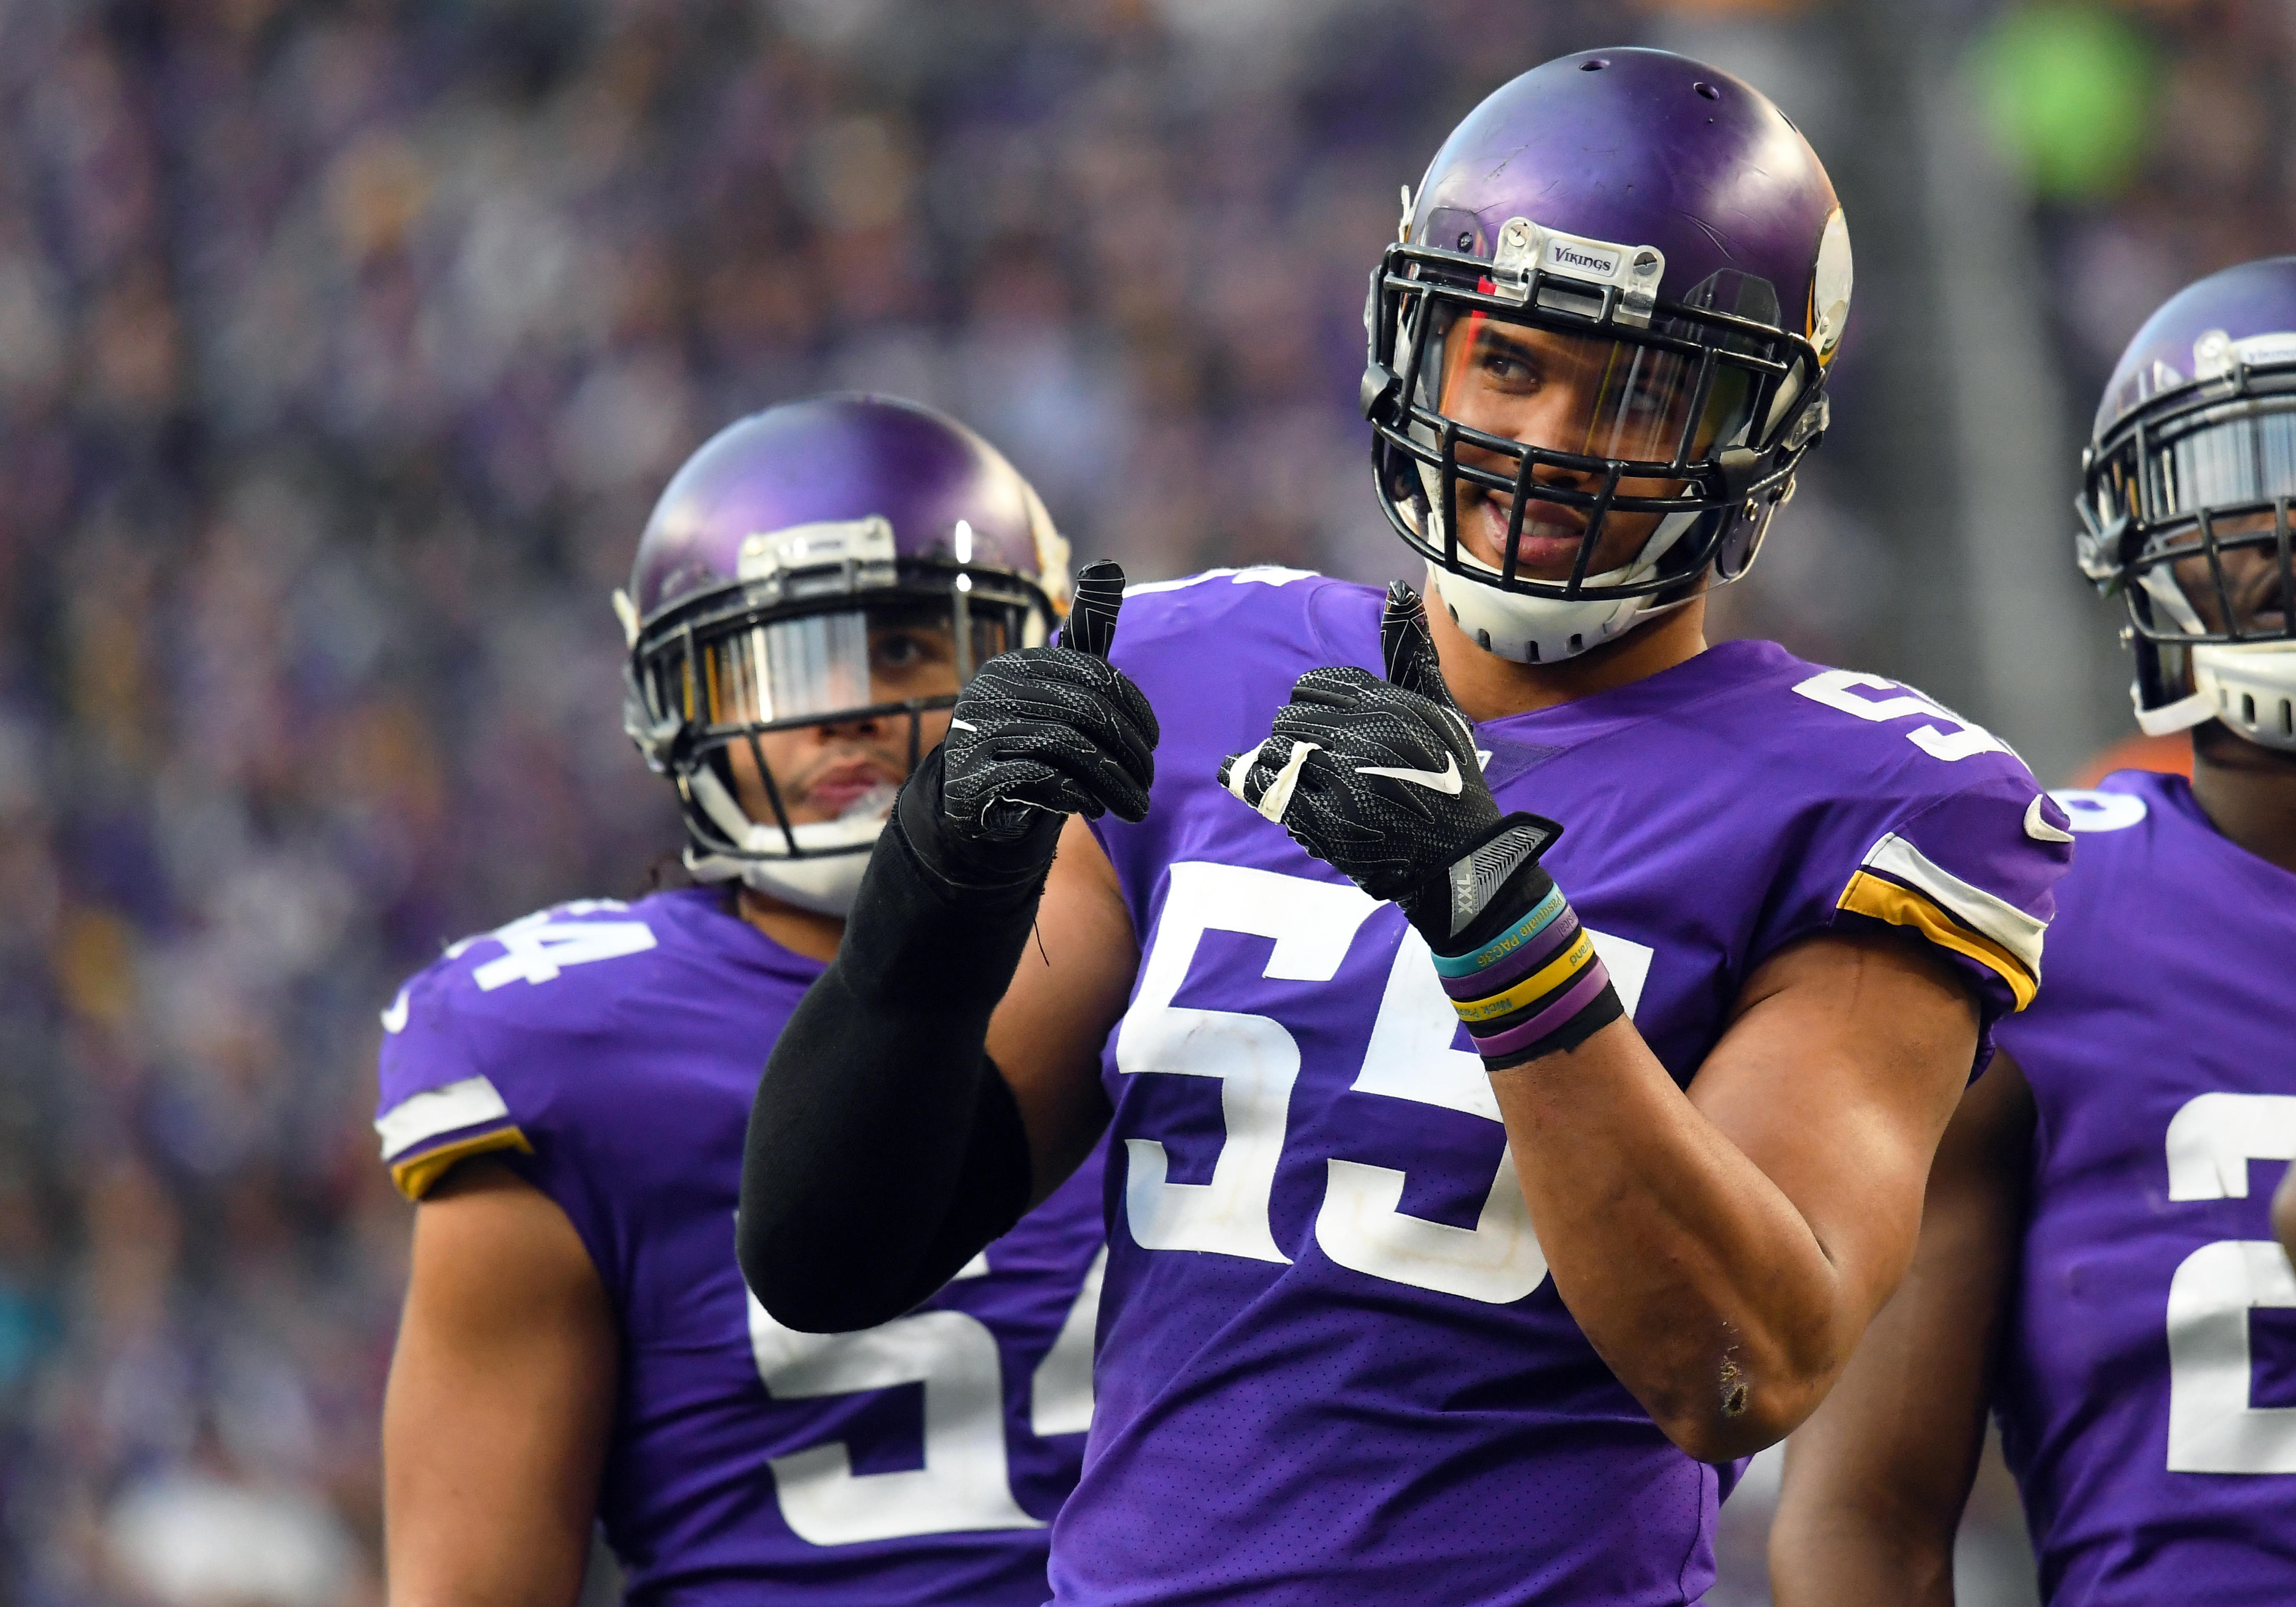 NFL: DEC 31 Bears at Vikings